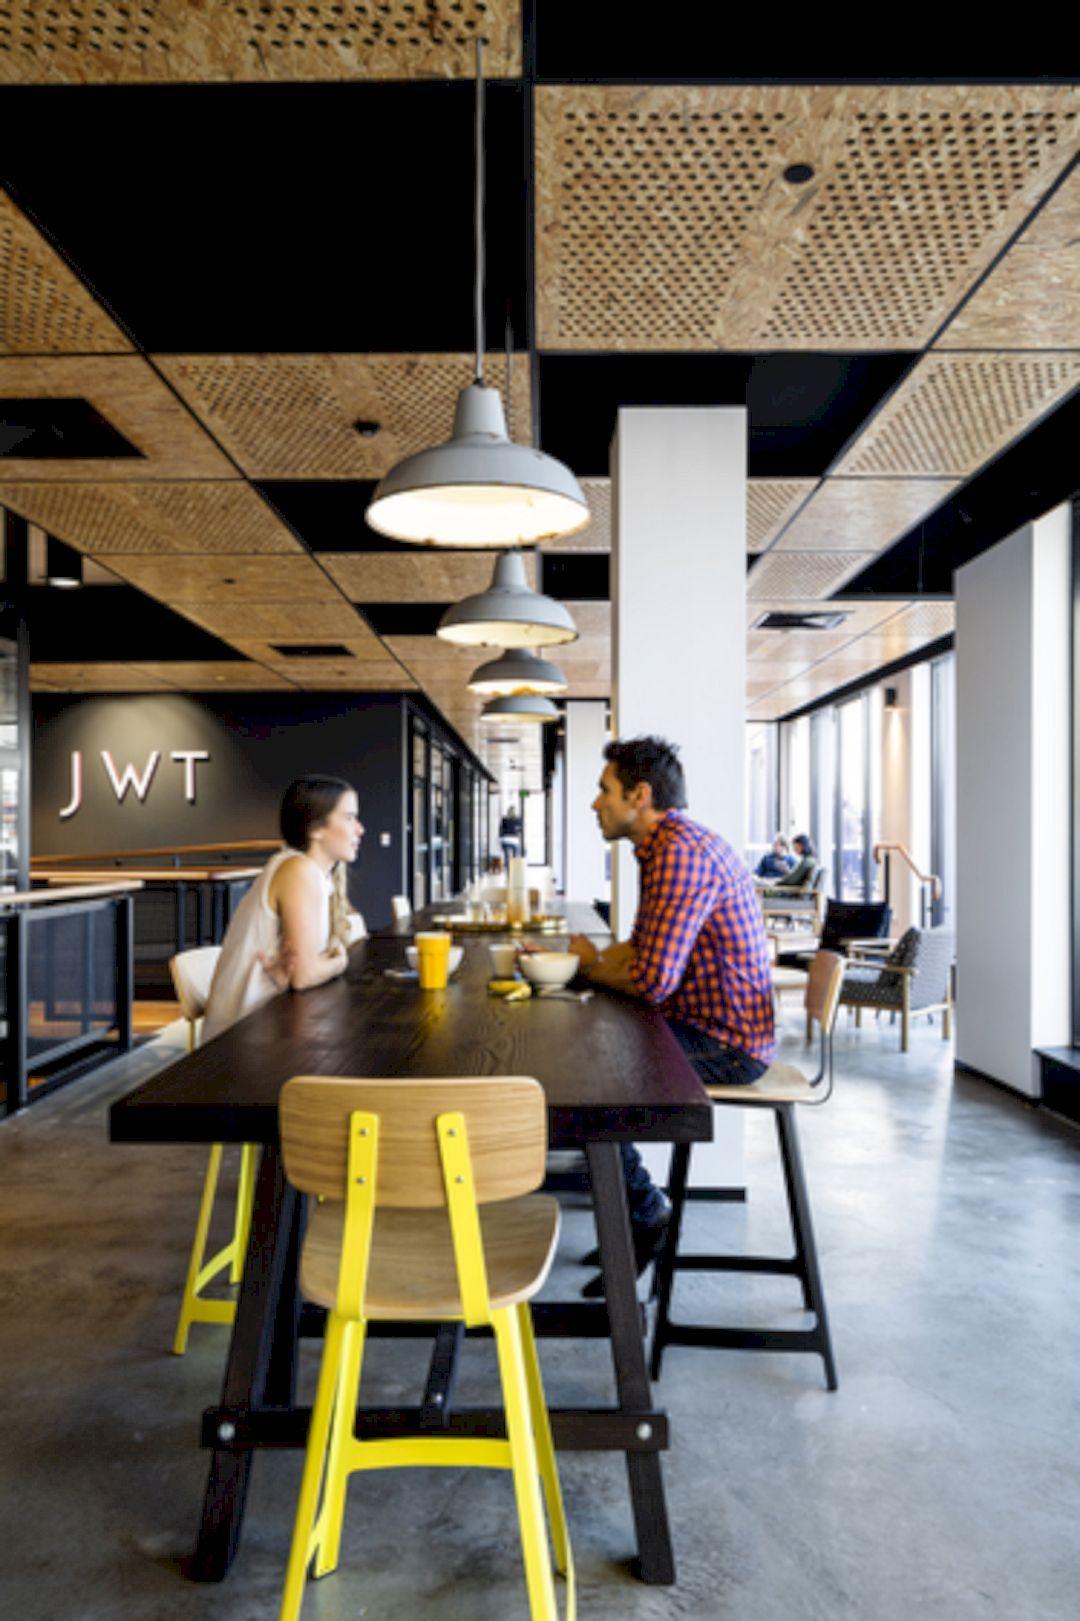 Beau Best Modern And Gorgeous Office Interior Design Ideas  Https://www.futuristarchitecture.com/23070 Office Interior.html